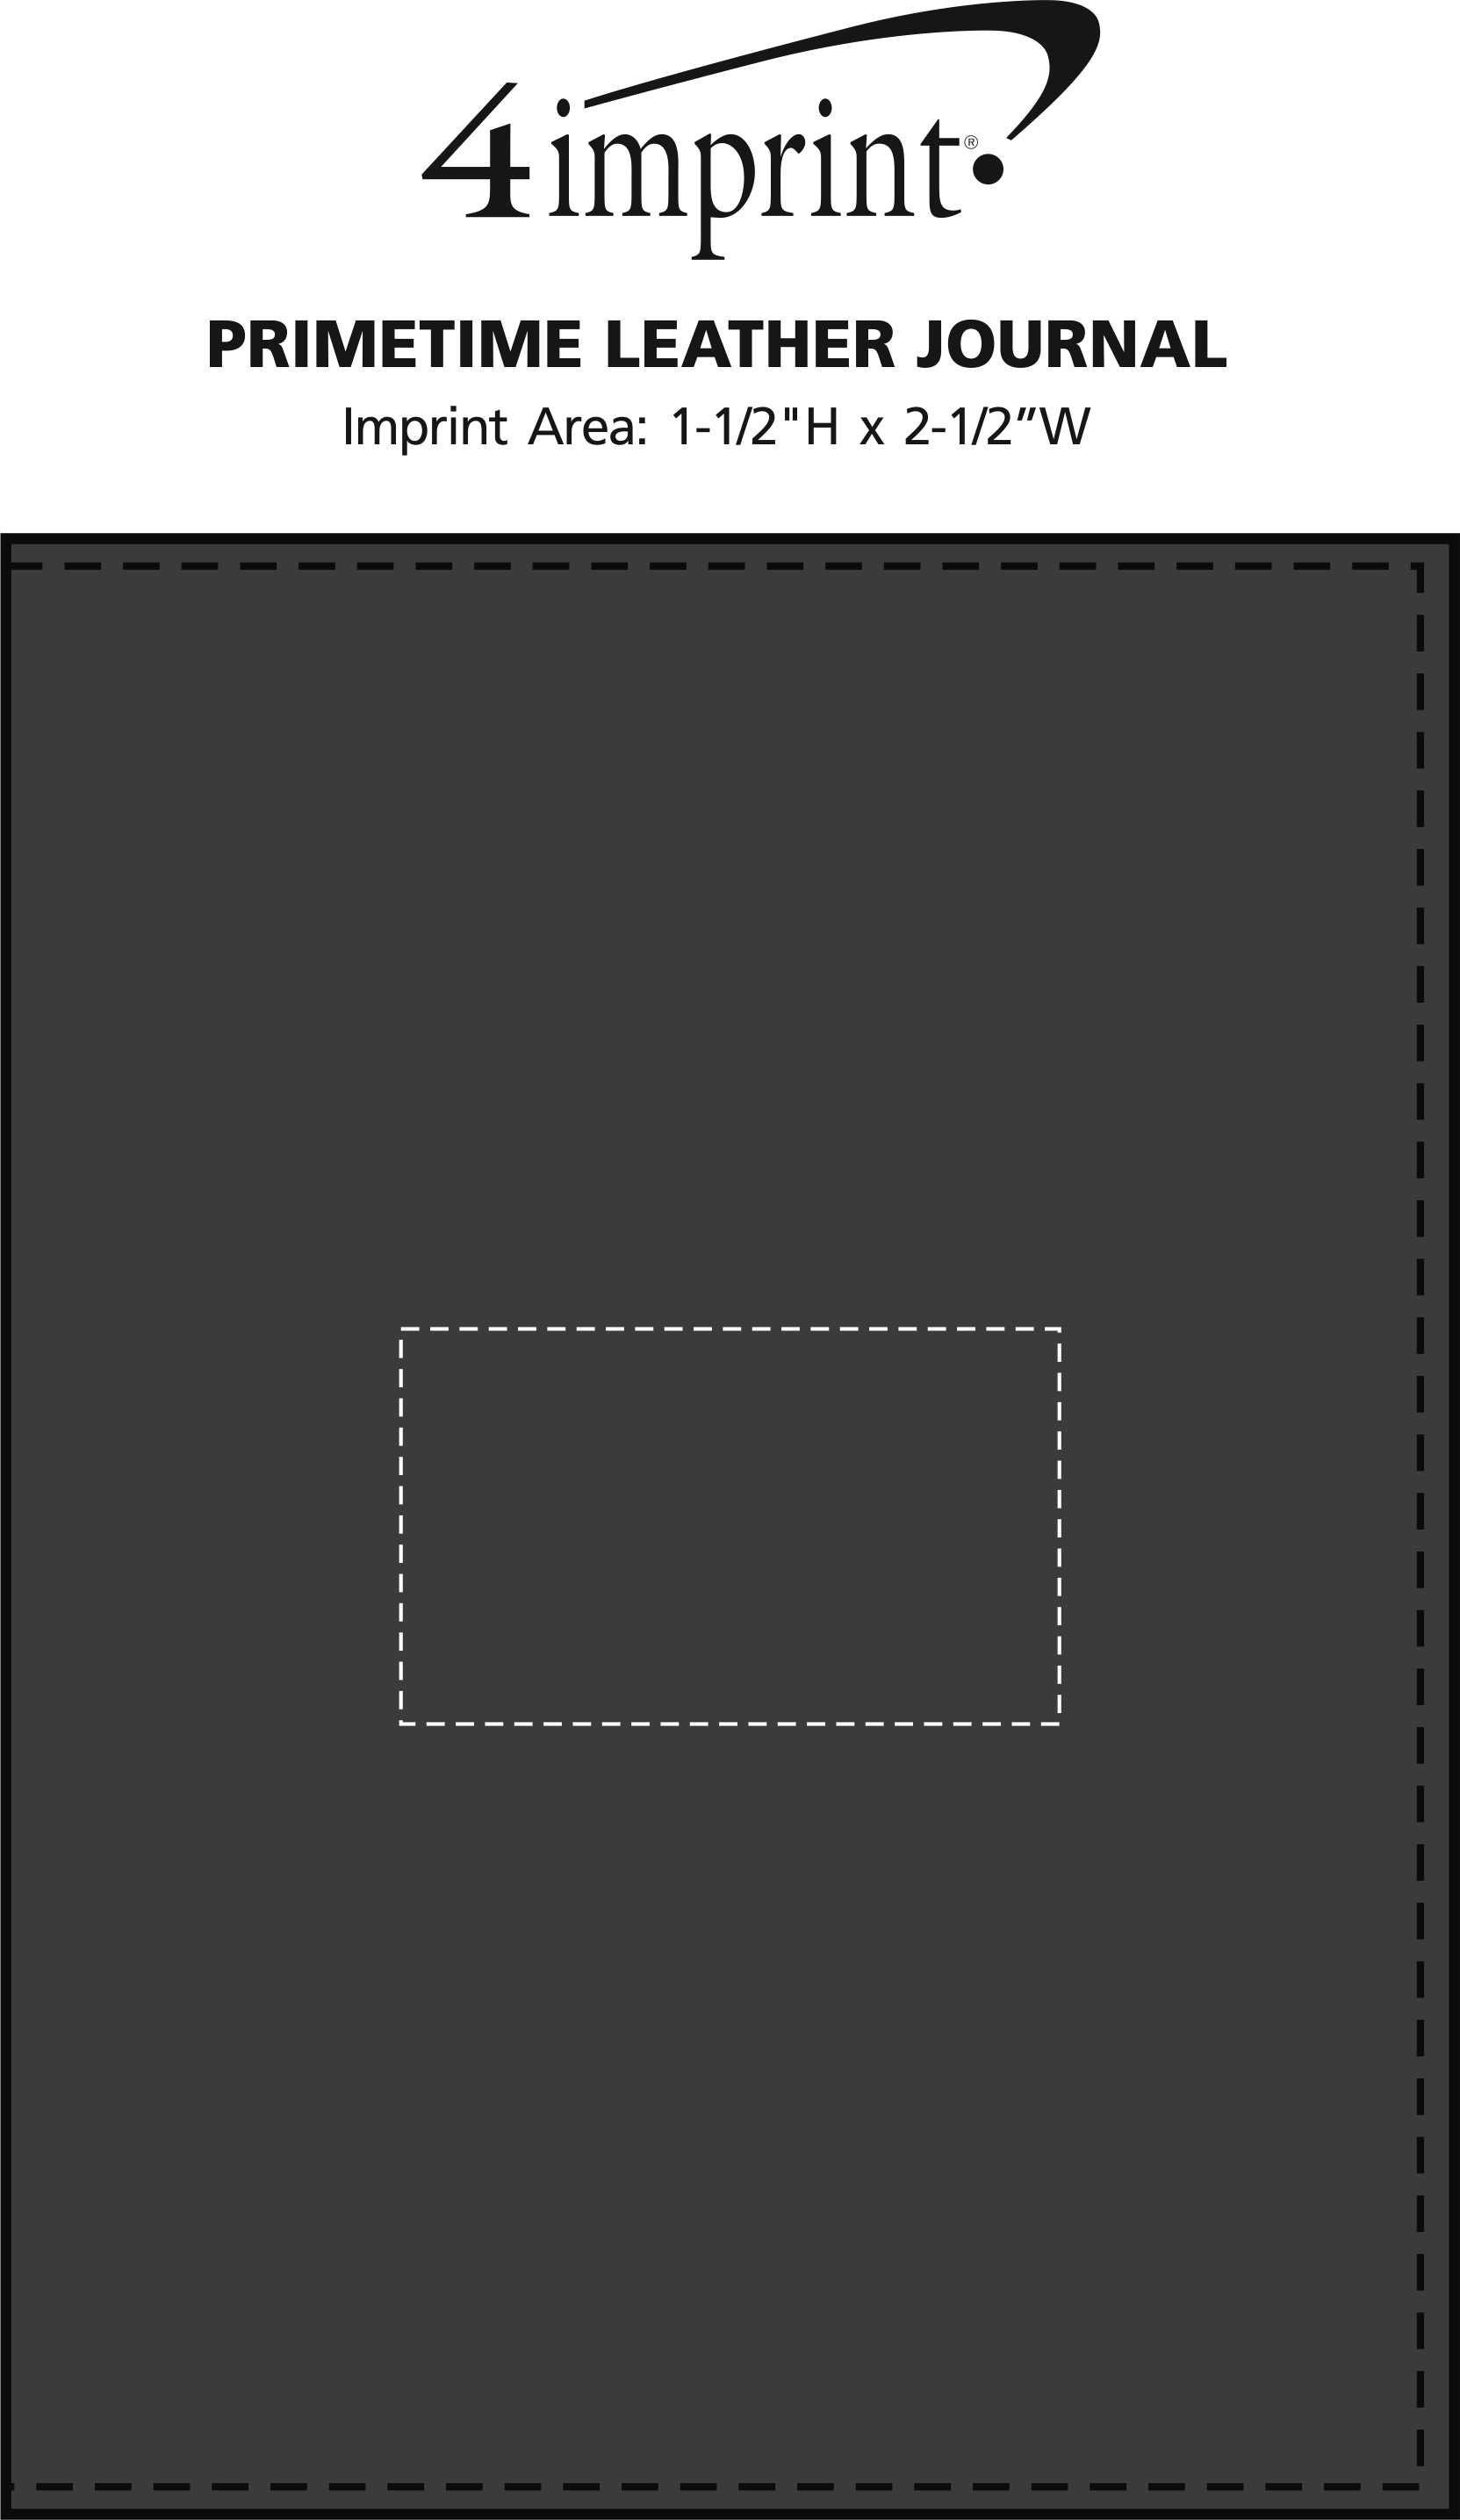 Imprint Area of Primetime Leather Journal